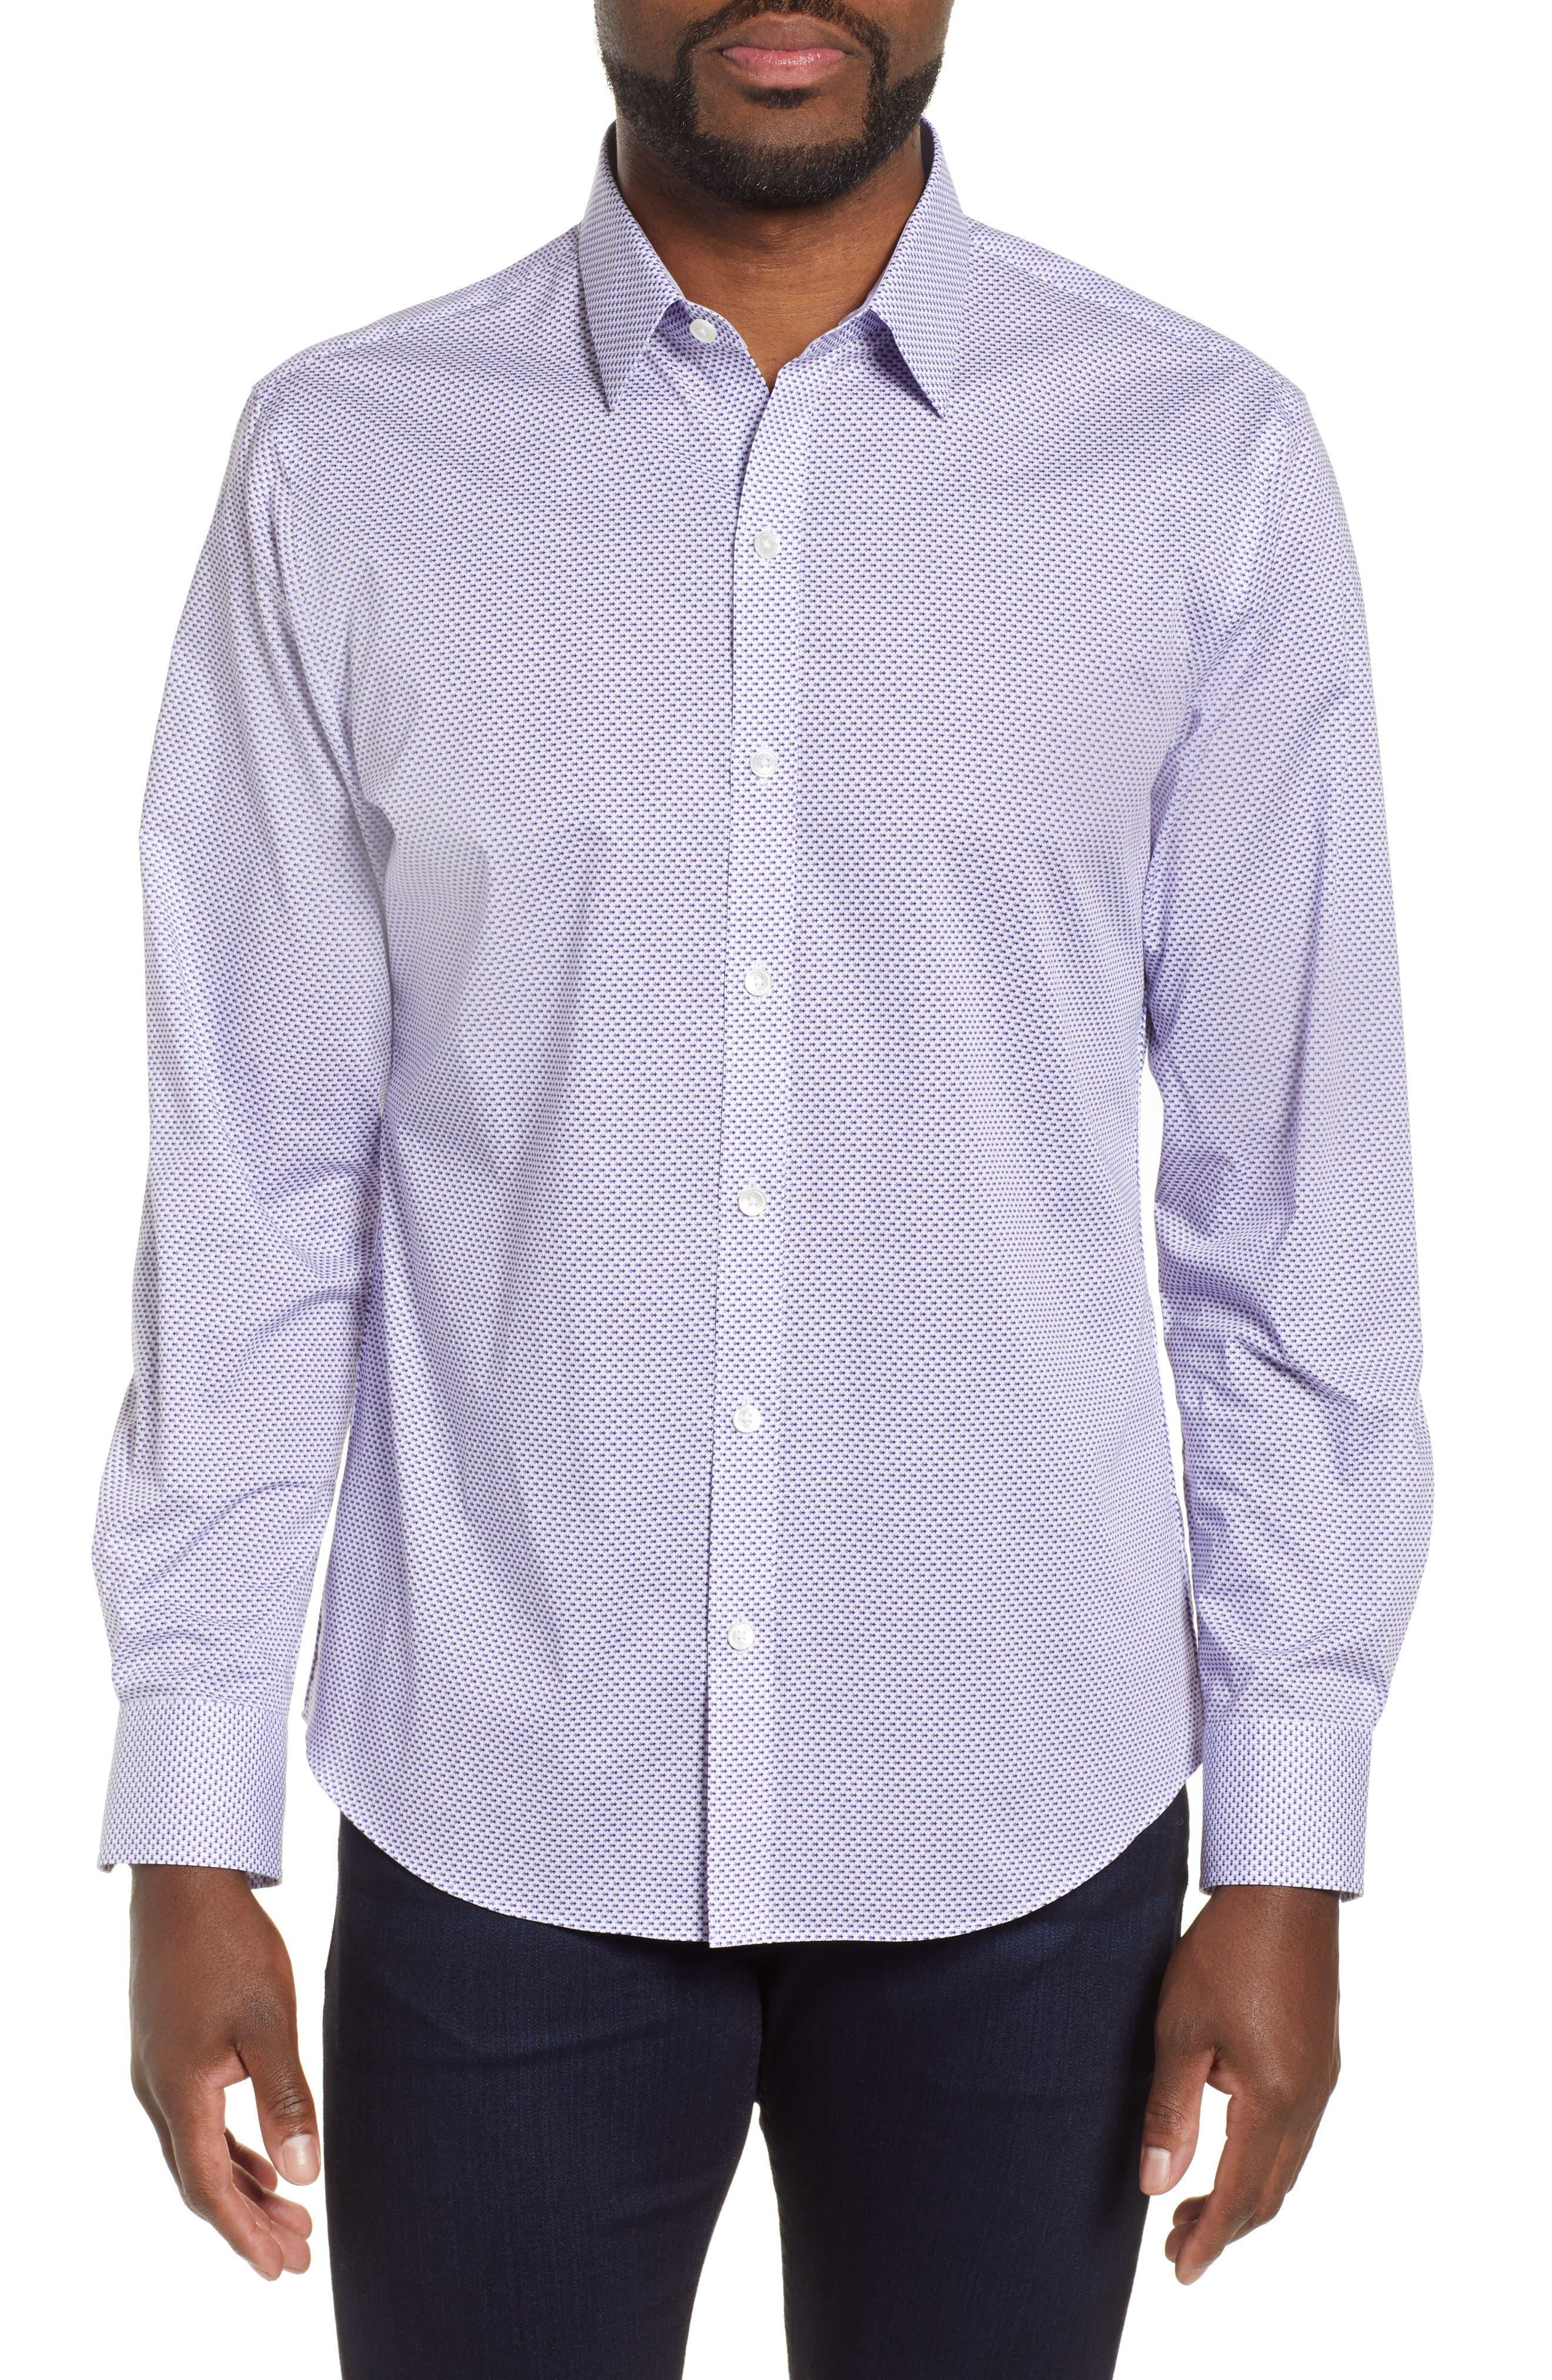 ZACHARY PRELL, Wilson Regular Fit Micro Print Sport Shirt, Main thumbnail 1, color, PURPLE